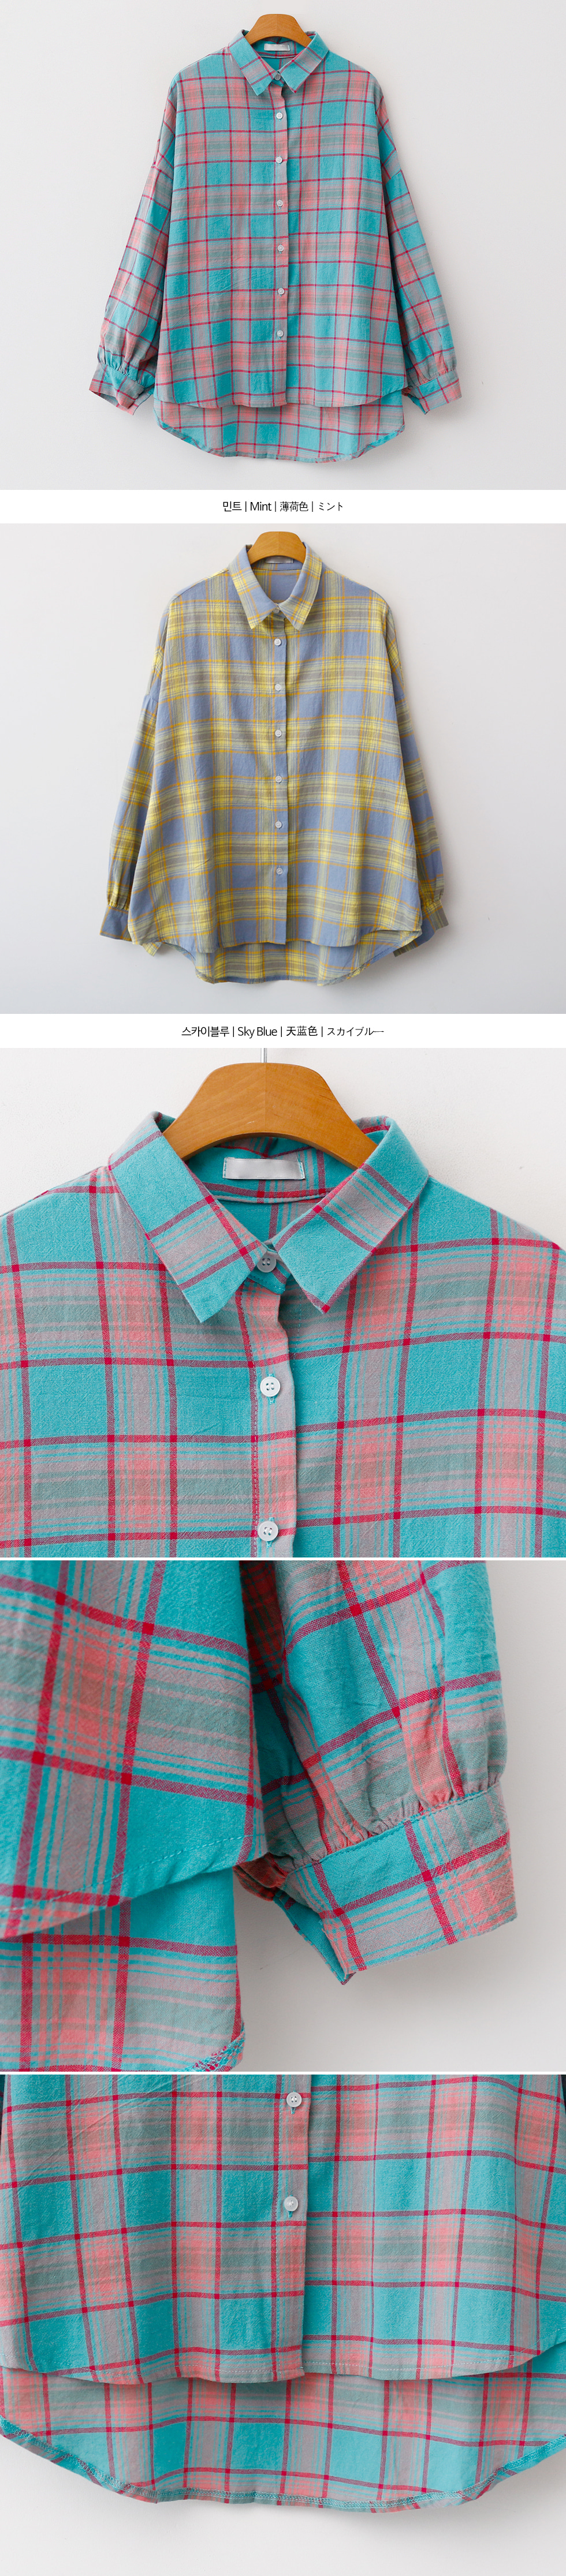 Sugar Ring shirt